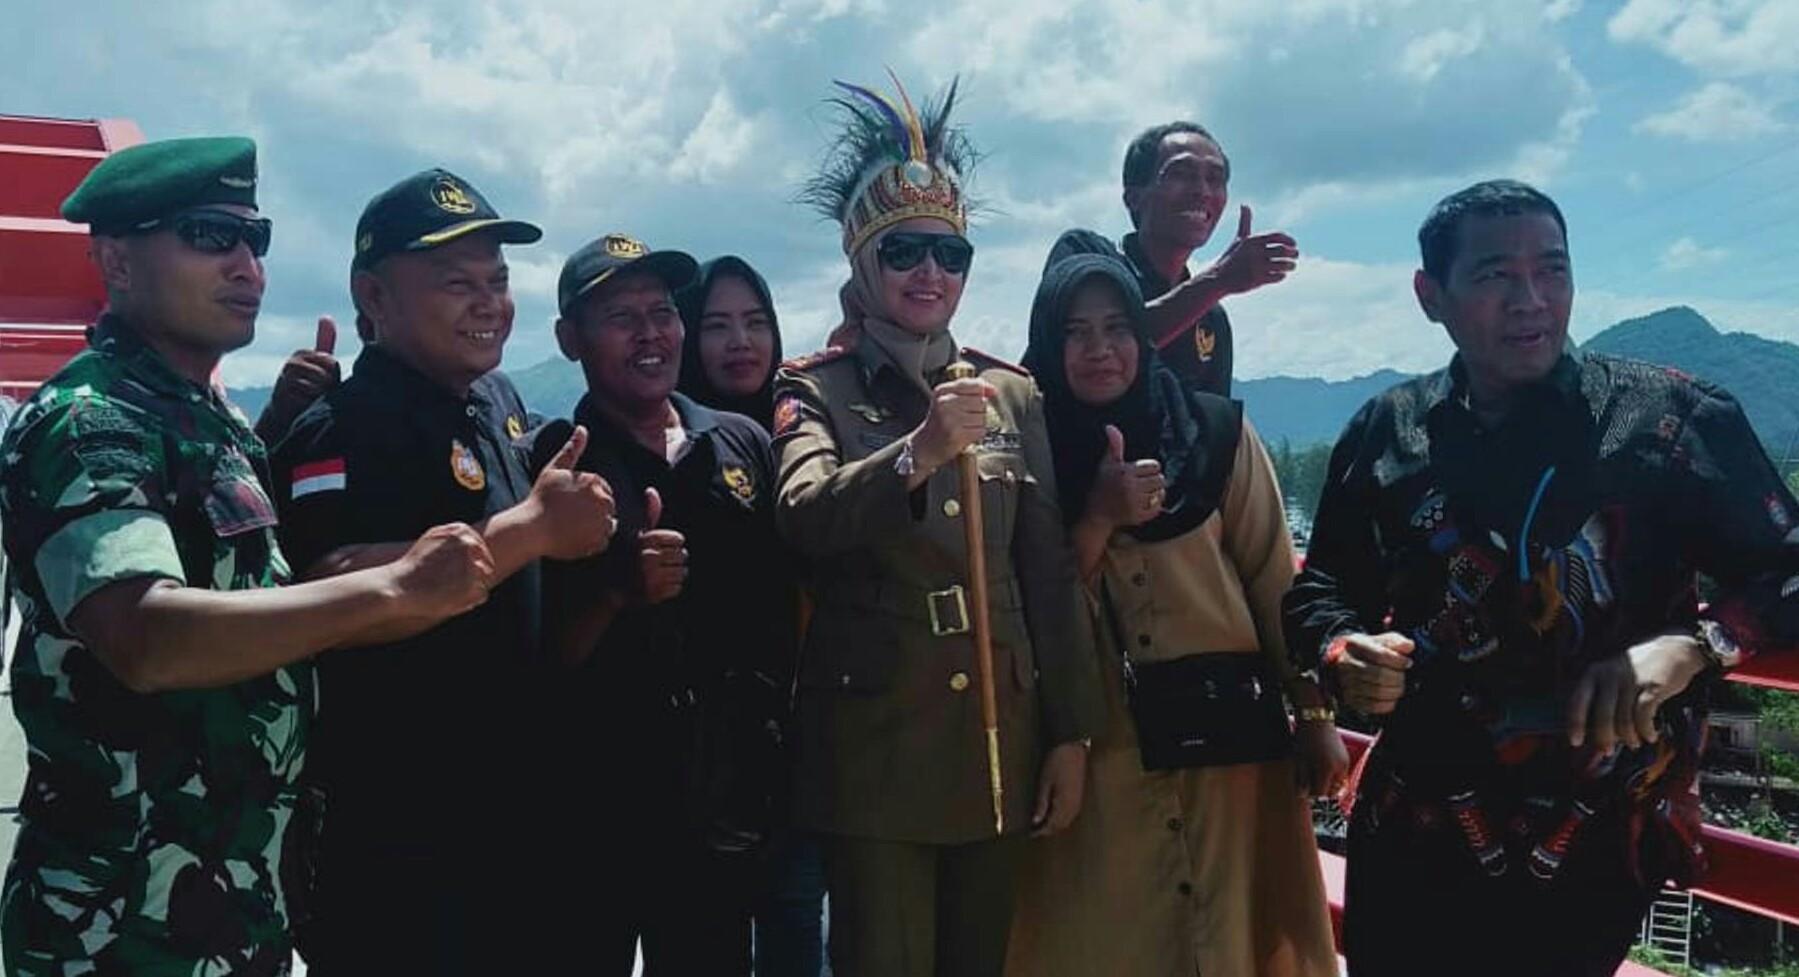 Kunjungi Papua, Bupati Jember Jajaki Kerjasama Pengembangan UMKM